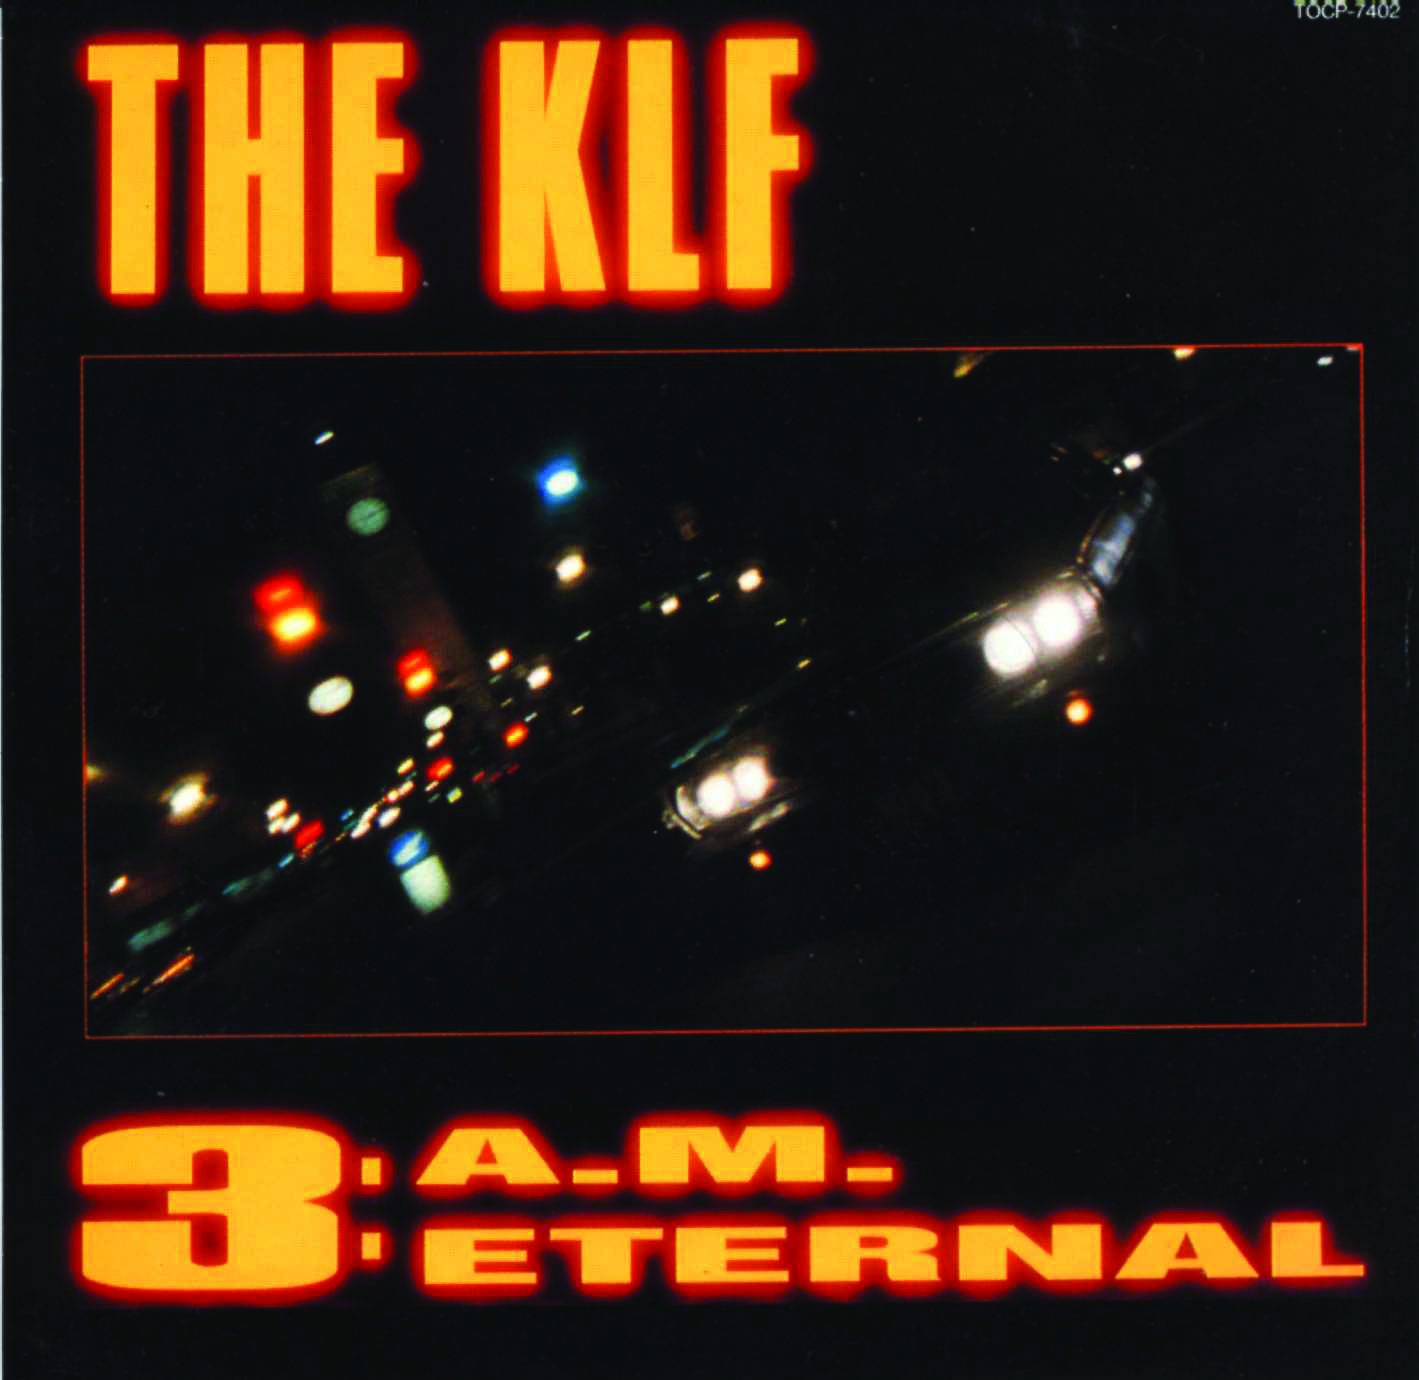 KLF, The - Love Trance (Pure Trance 3)